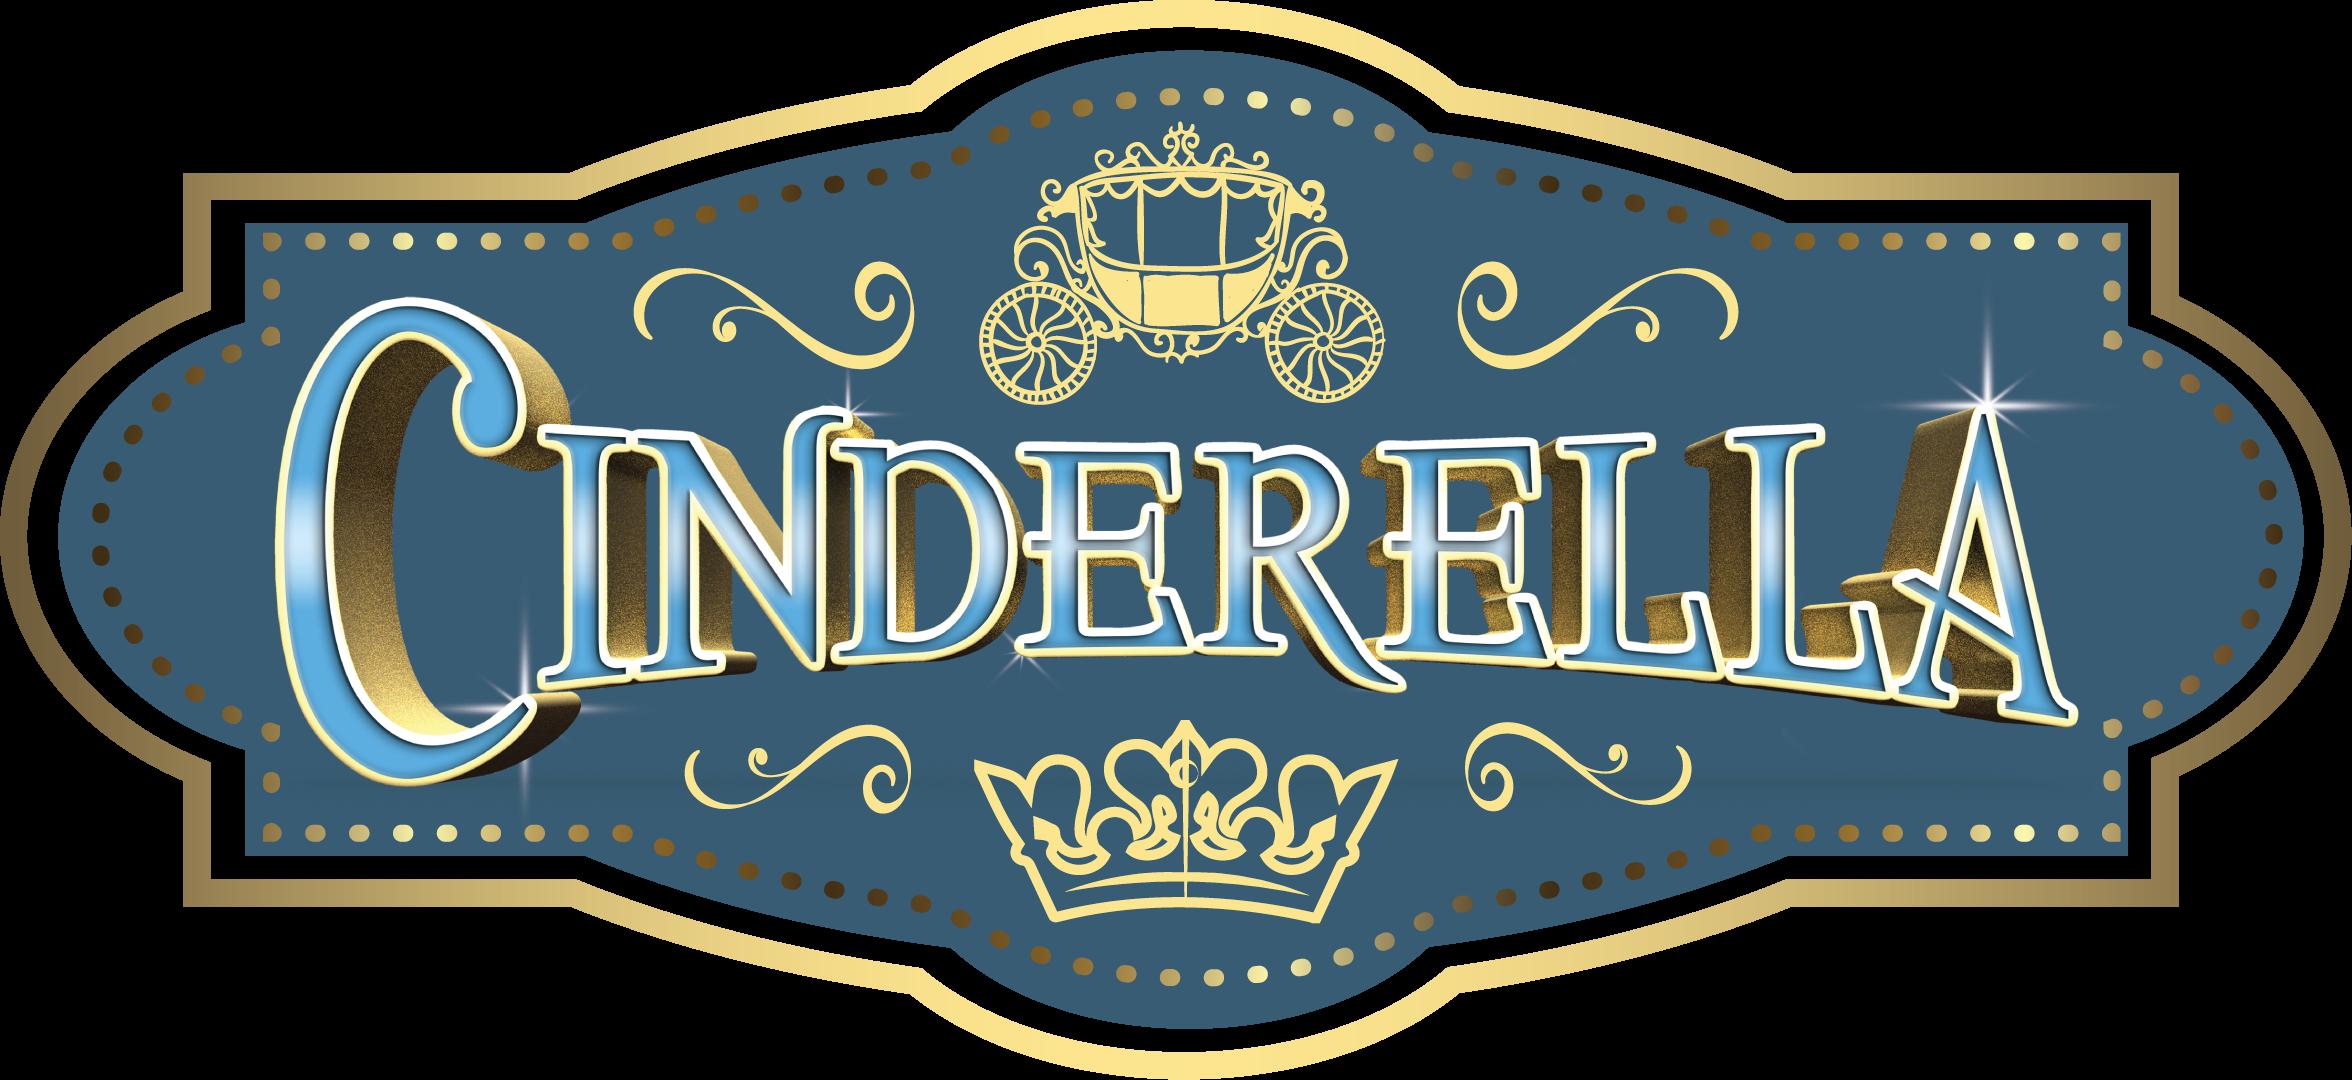 PNG HD Of Cinderella - 130648